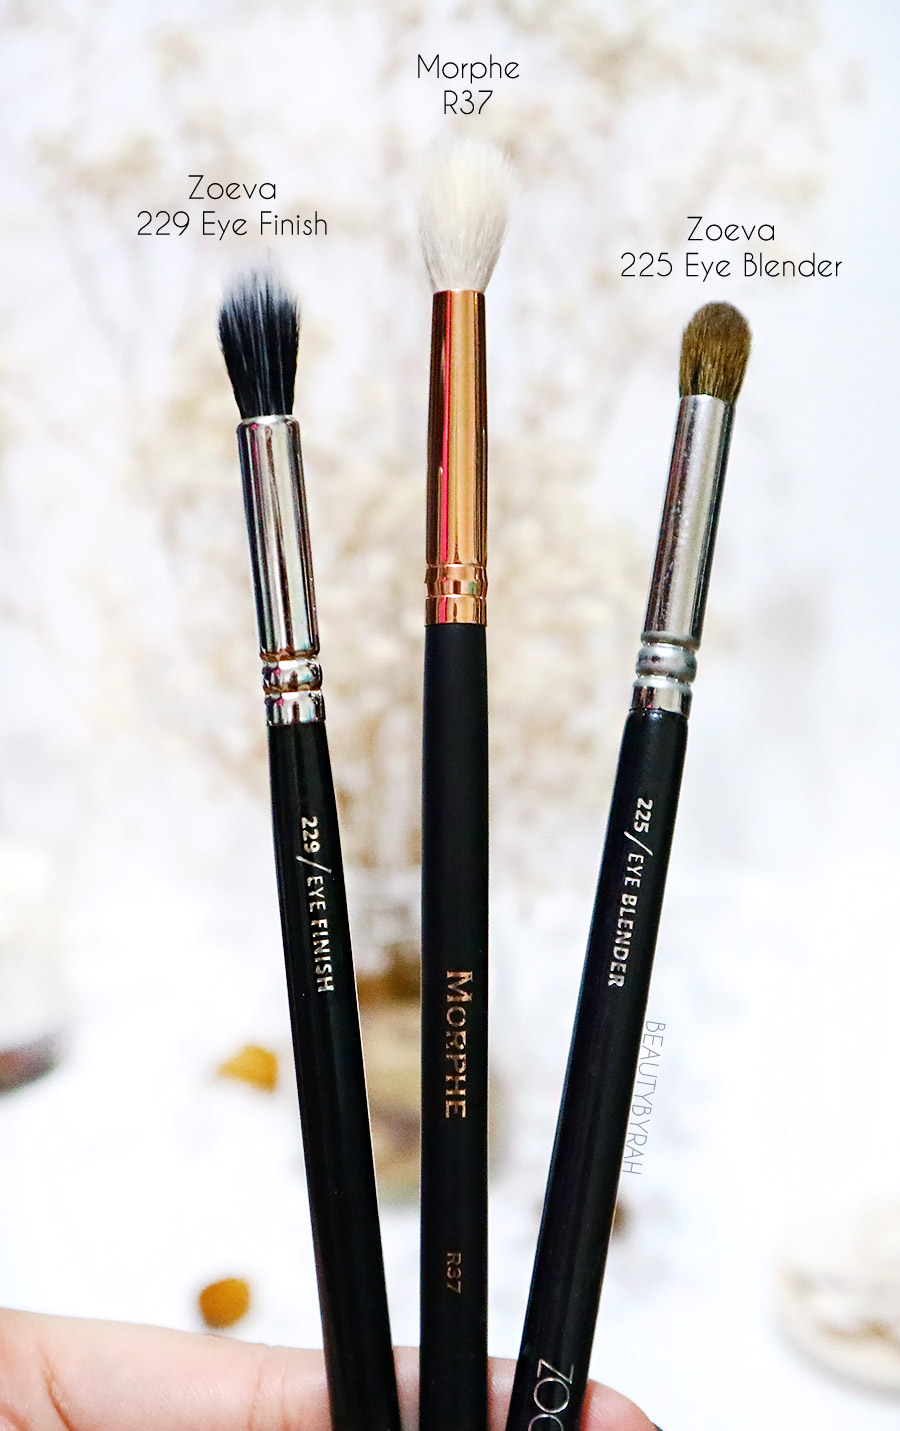 Top affordable eyeshadow brushes beginners - Zoeva 229 Zoeva 225 Morphe R37